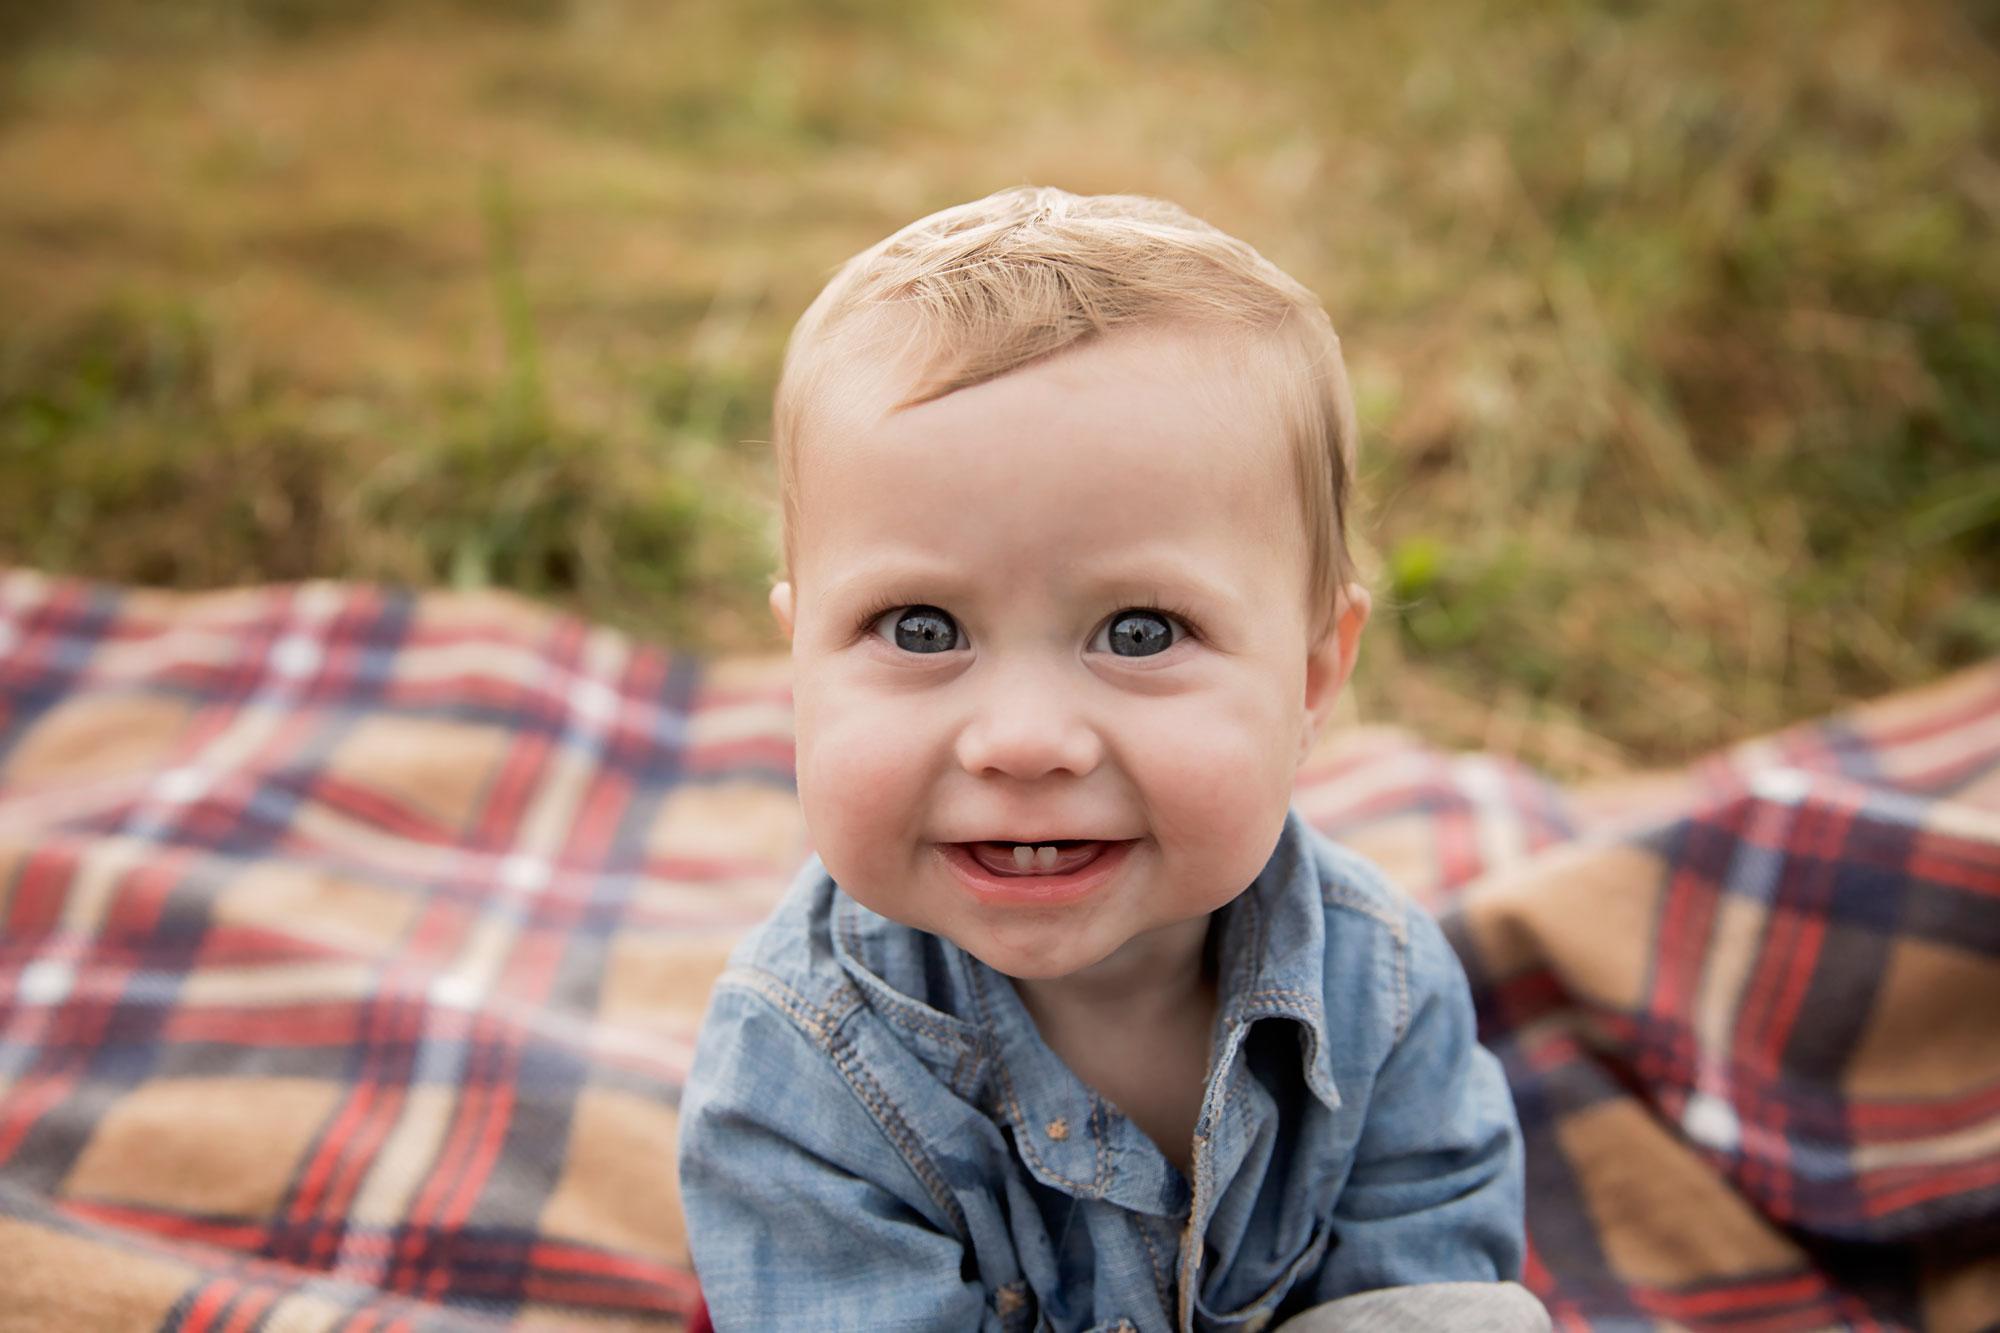 gatlinburg-baby-smiling-photographer.jpg